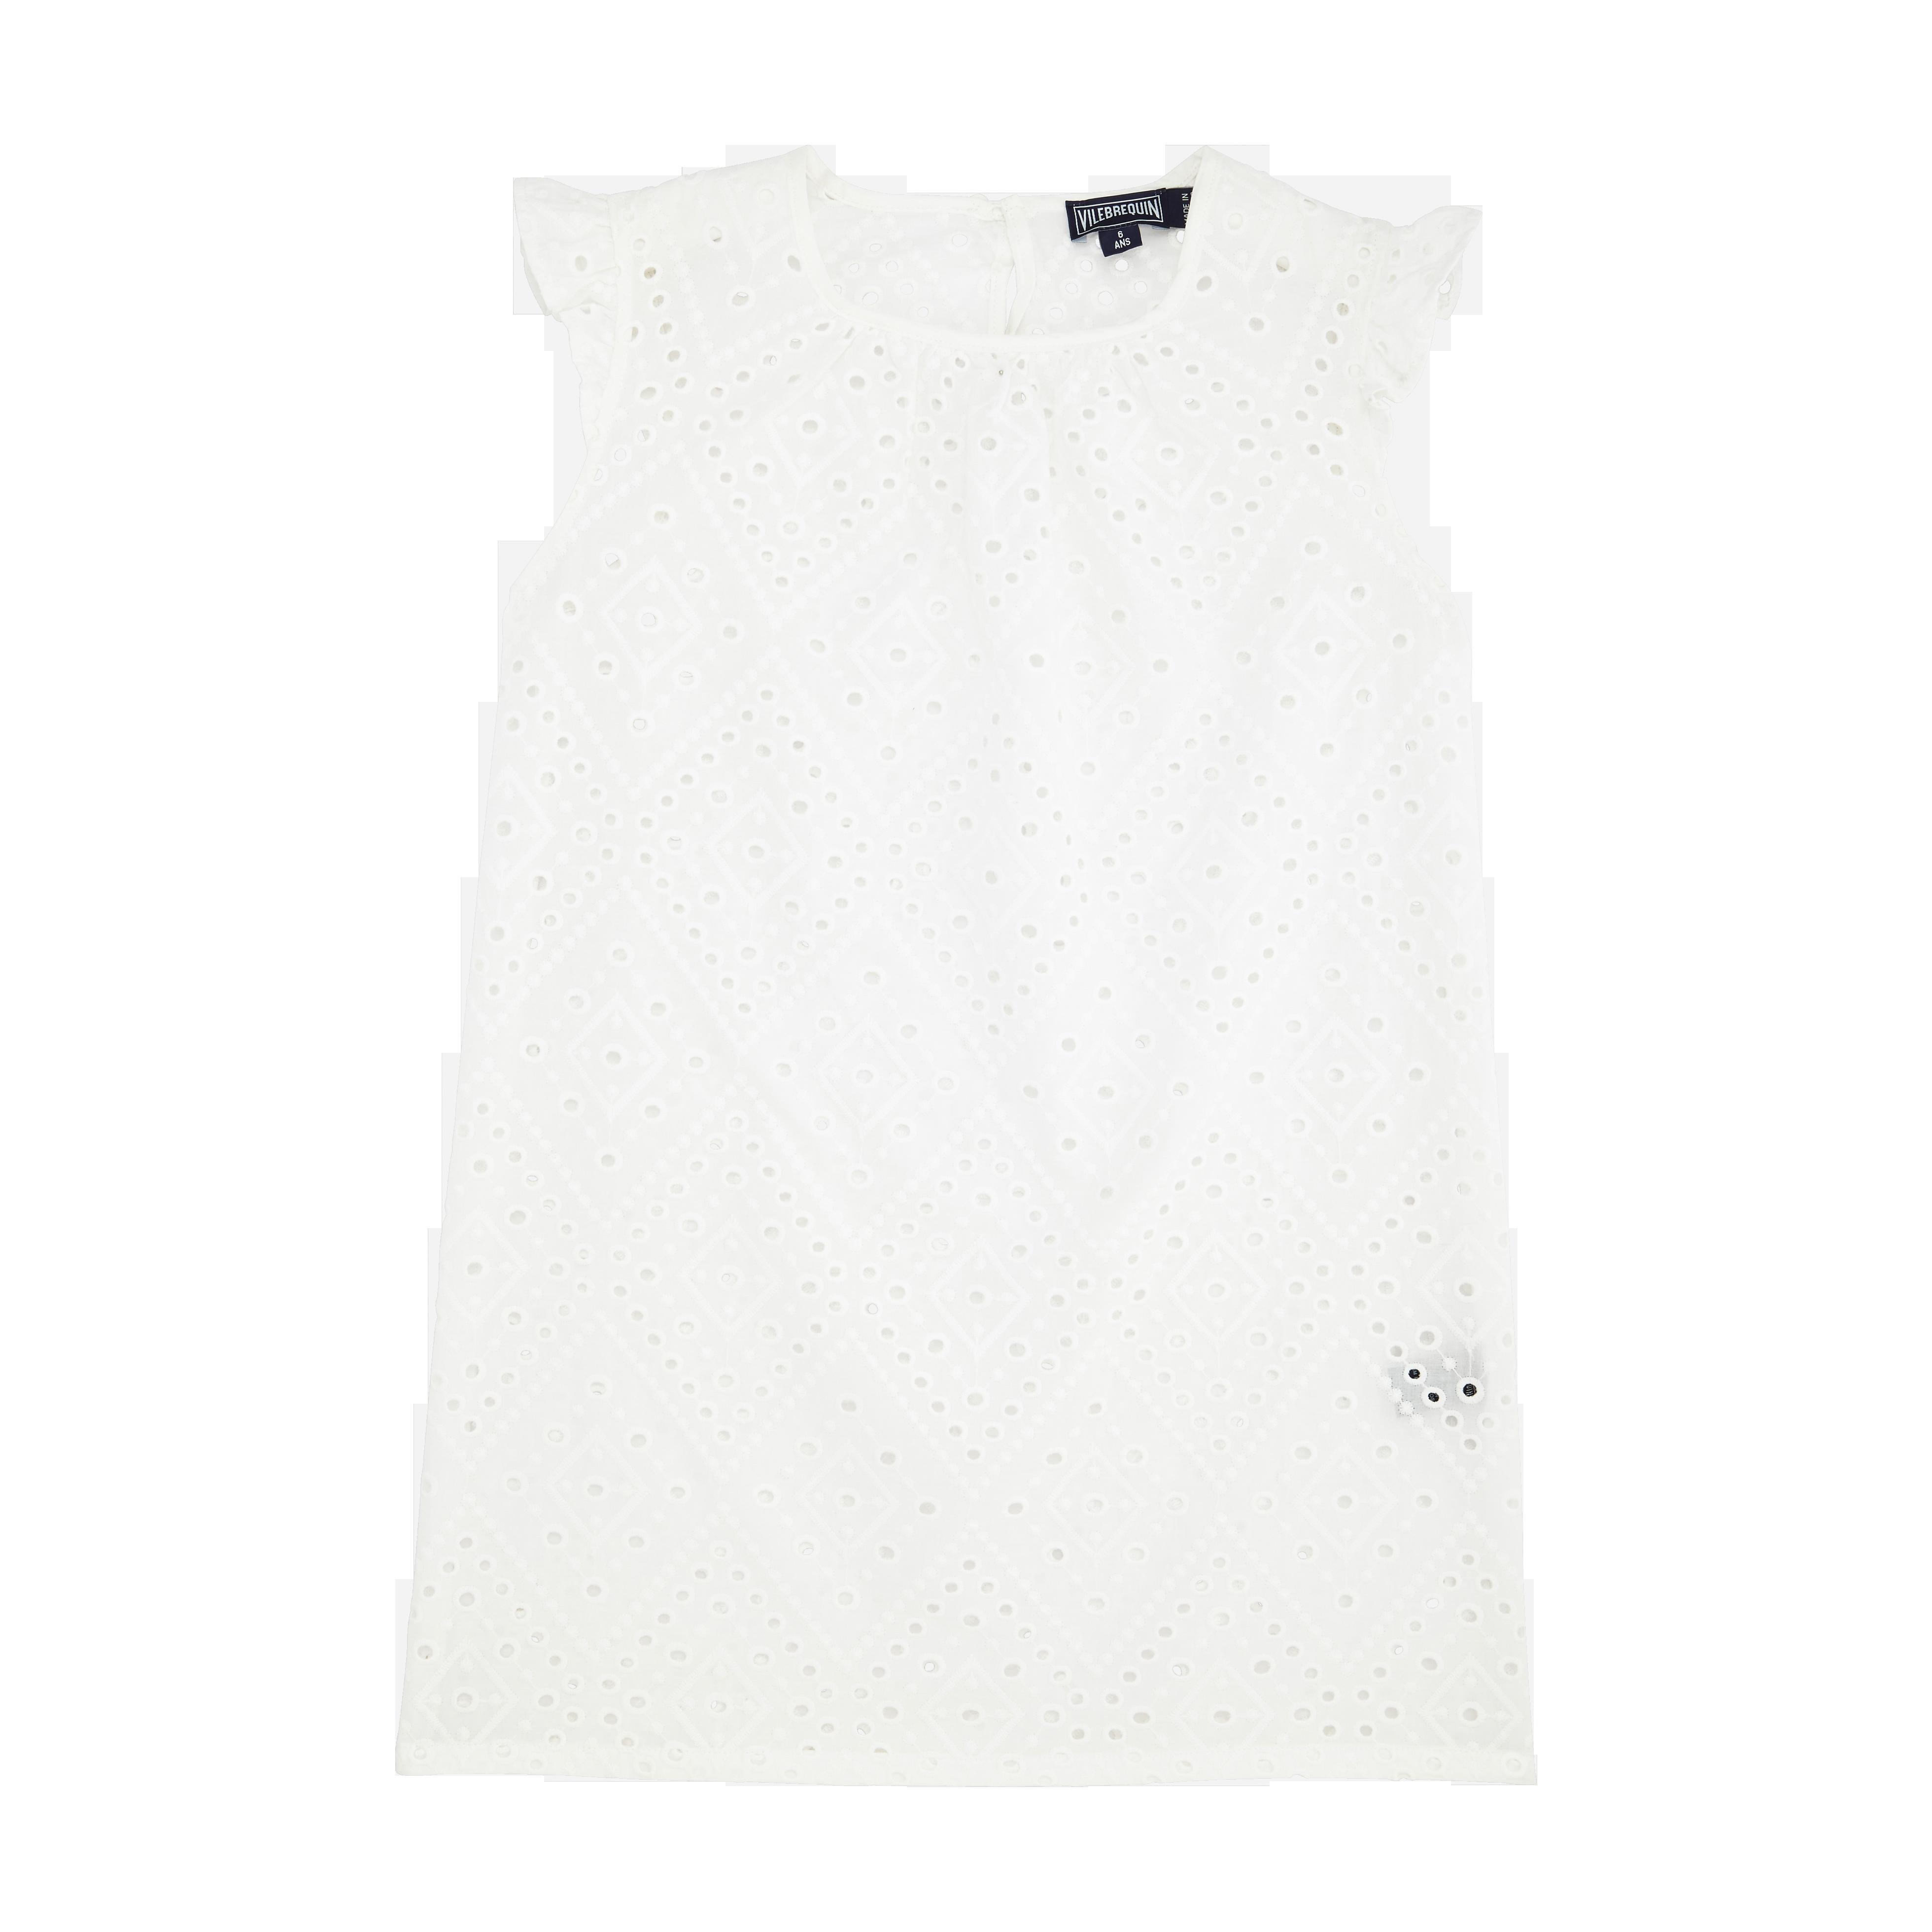 VILEBREQUIN | Girls Ready to Wear - Girls Cotton Dress Eyelet Embroidery - DRESS - GABIS - White - 14 - Vilebrequin | Goxip